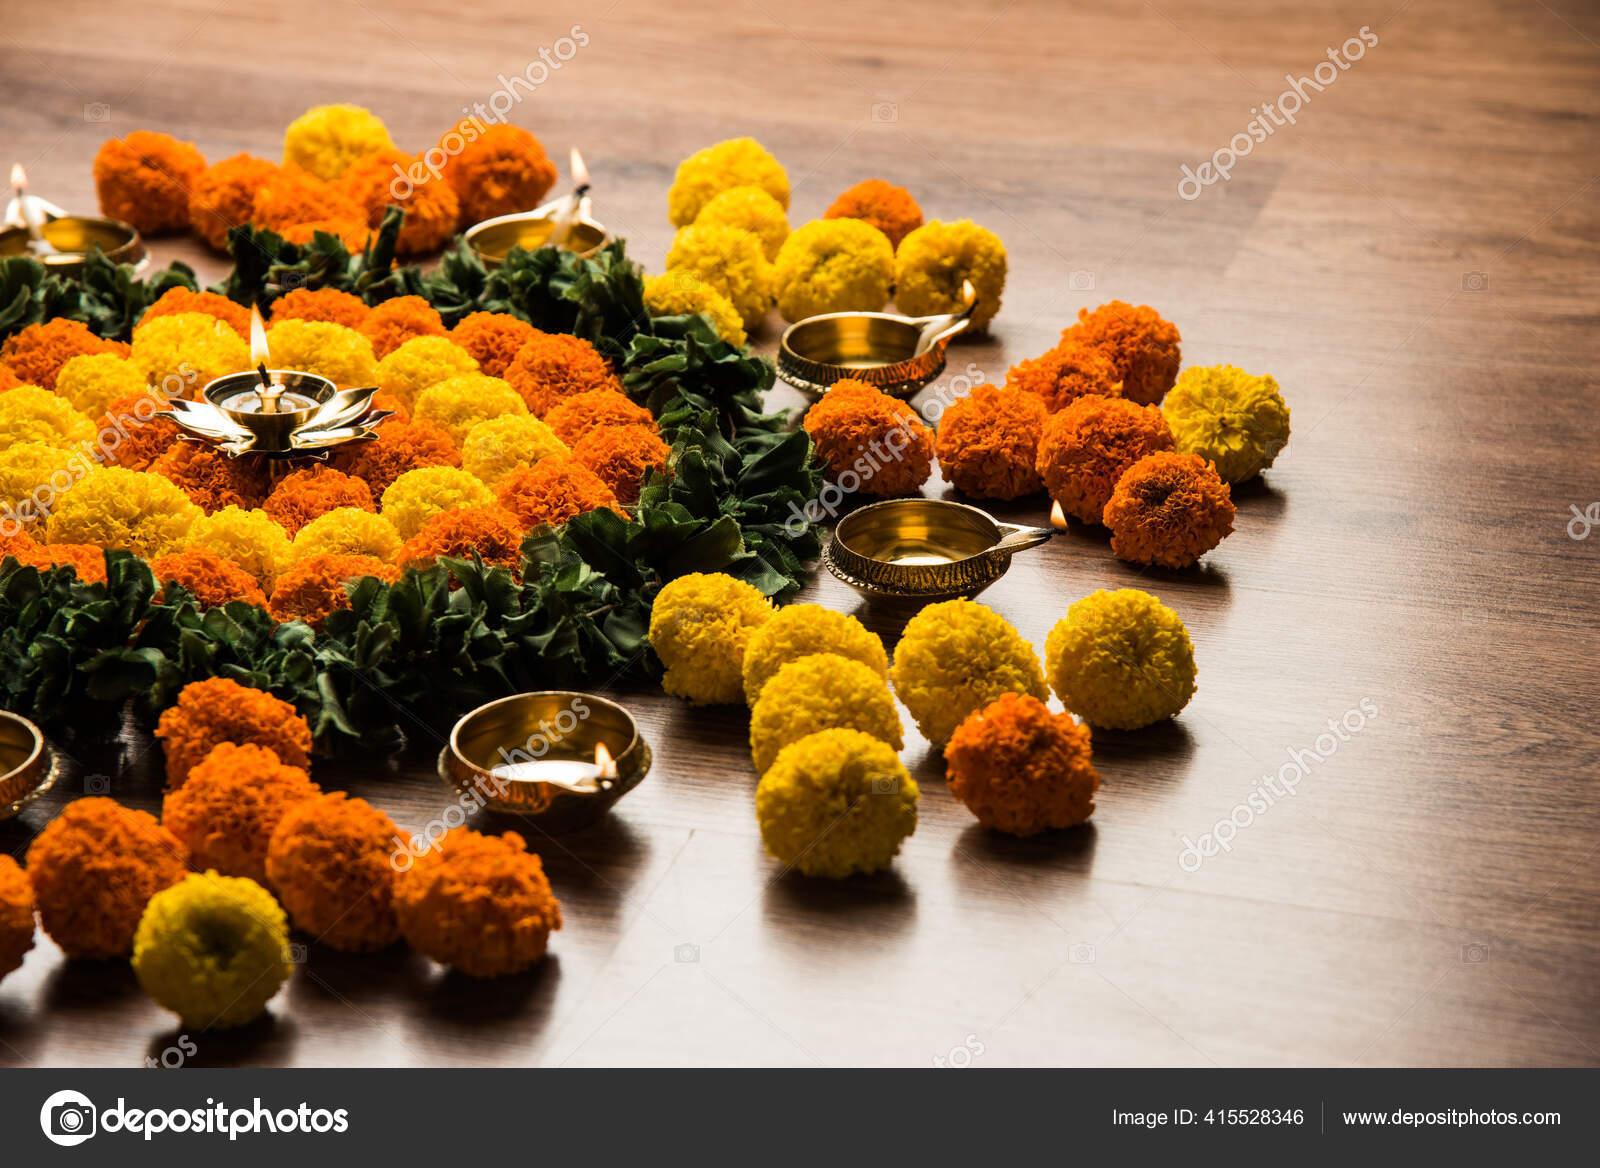 Flower Rangoli Diwali Pongal Festival Made Using Marigold Zendu Flowers Stock Photo C Stockimagefactory Com 415528346